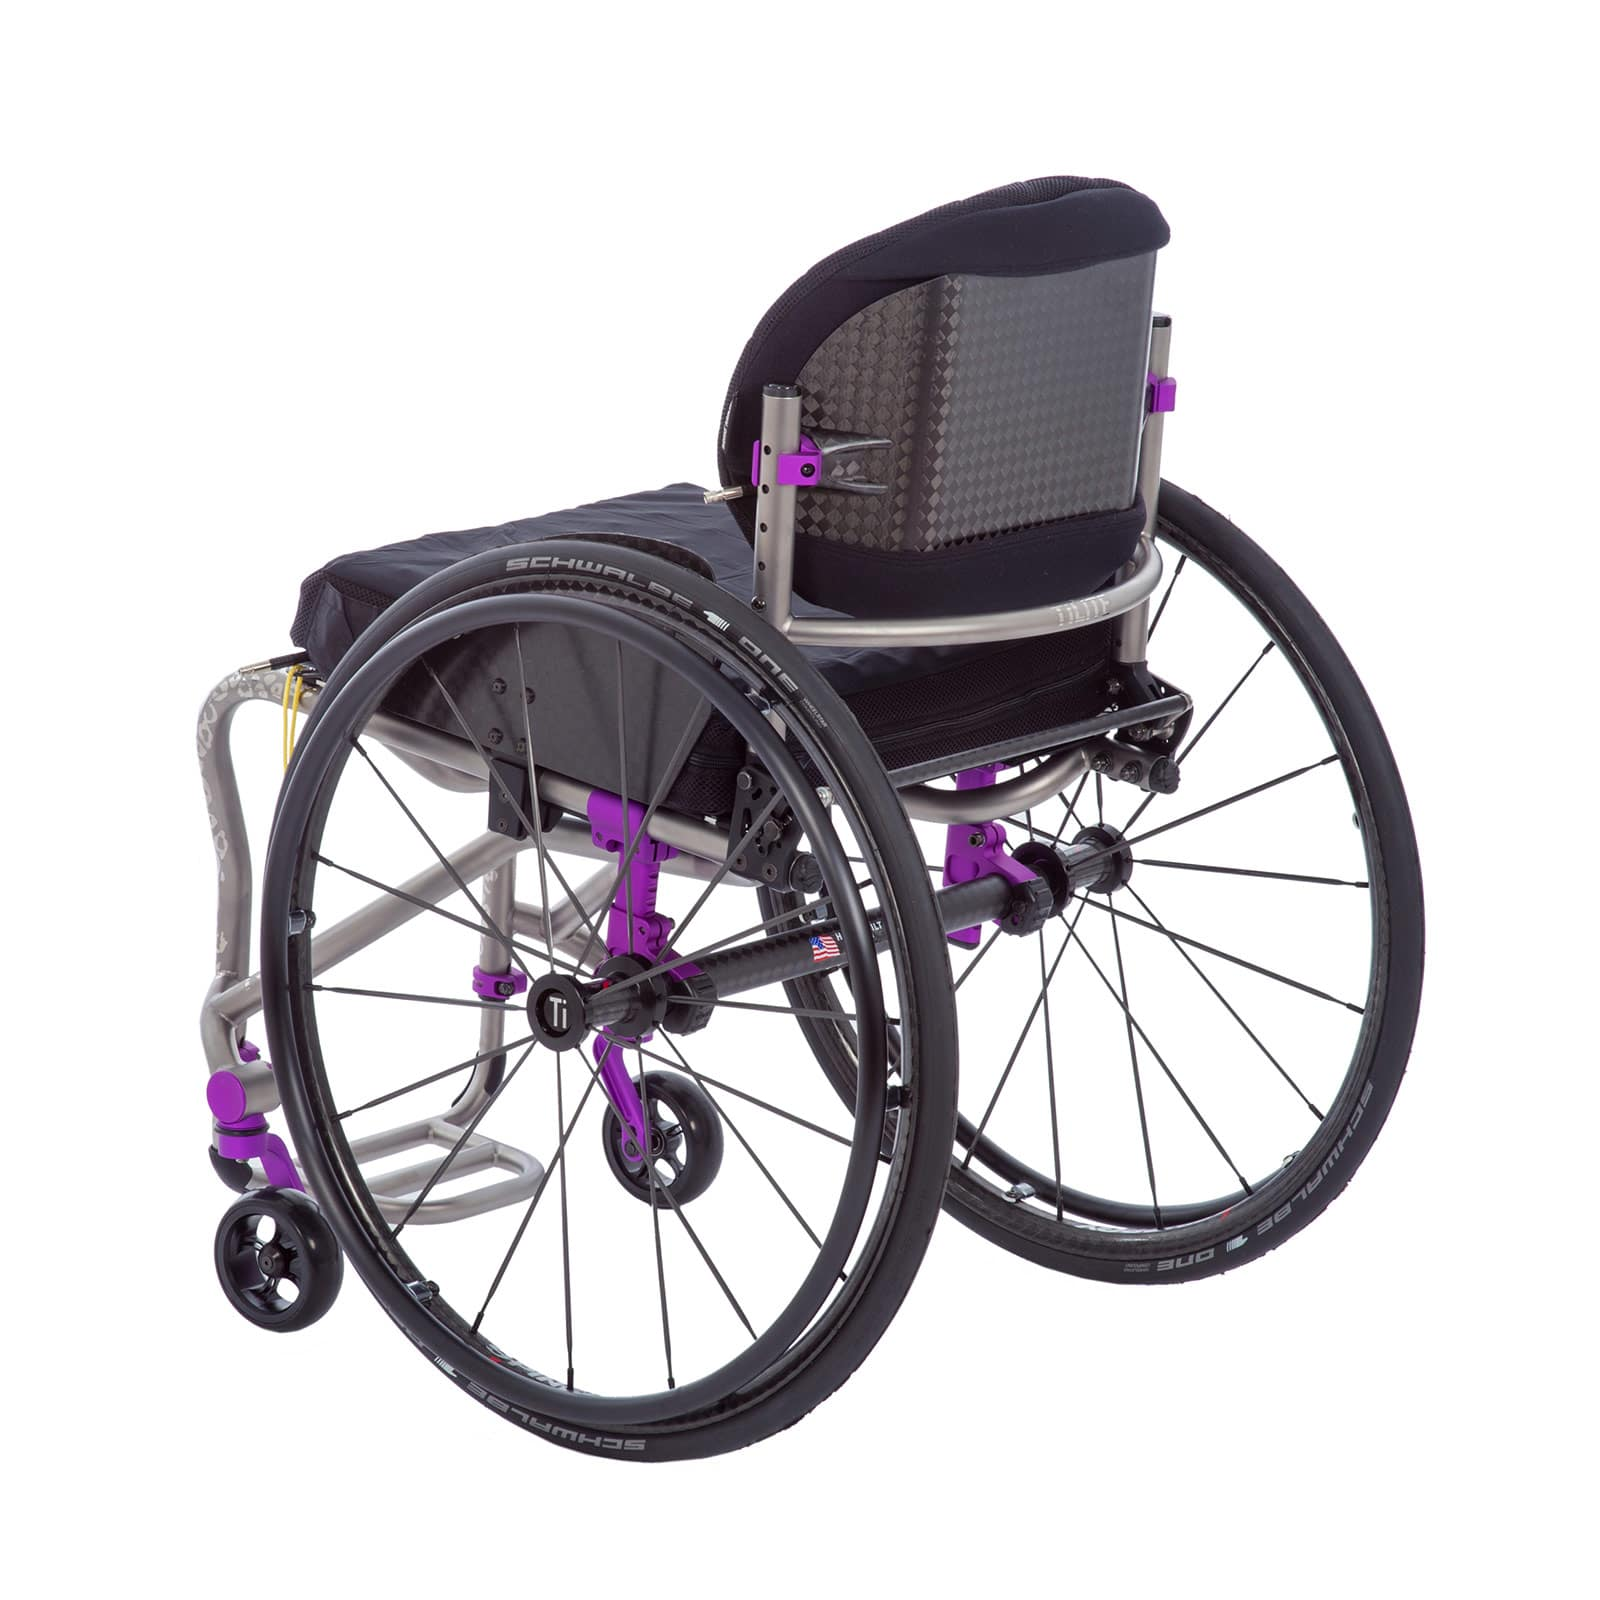 TiLite TRA Rigid Titanium Wheelchair FREE SHIPPING How iRoll Sports